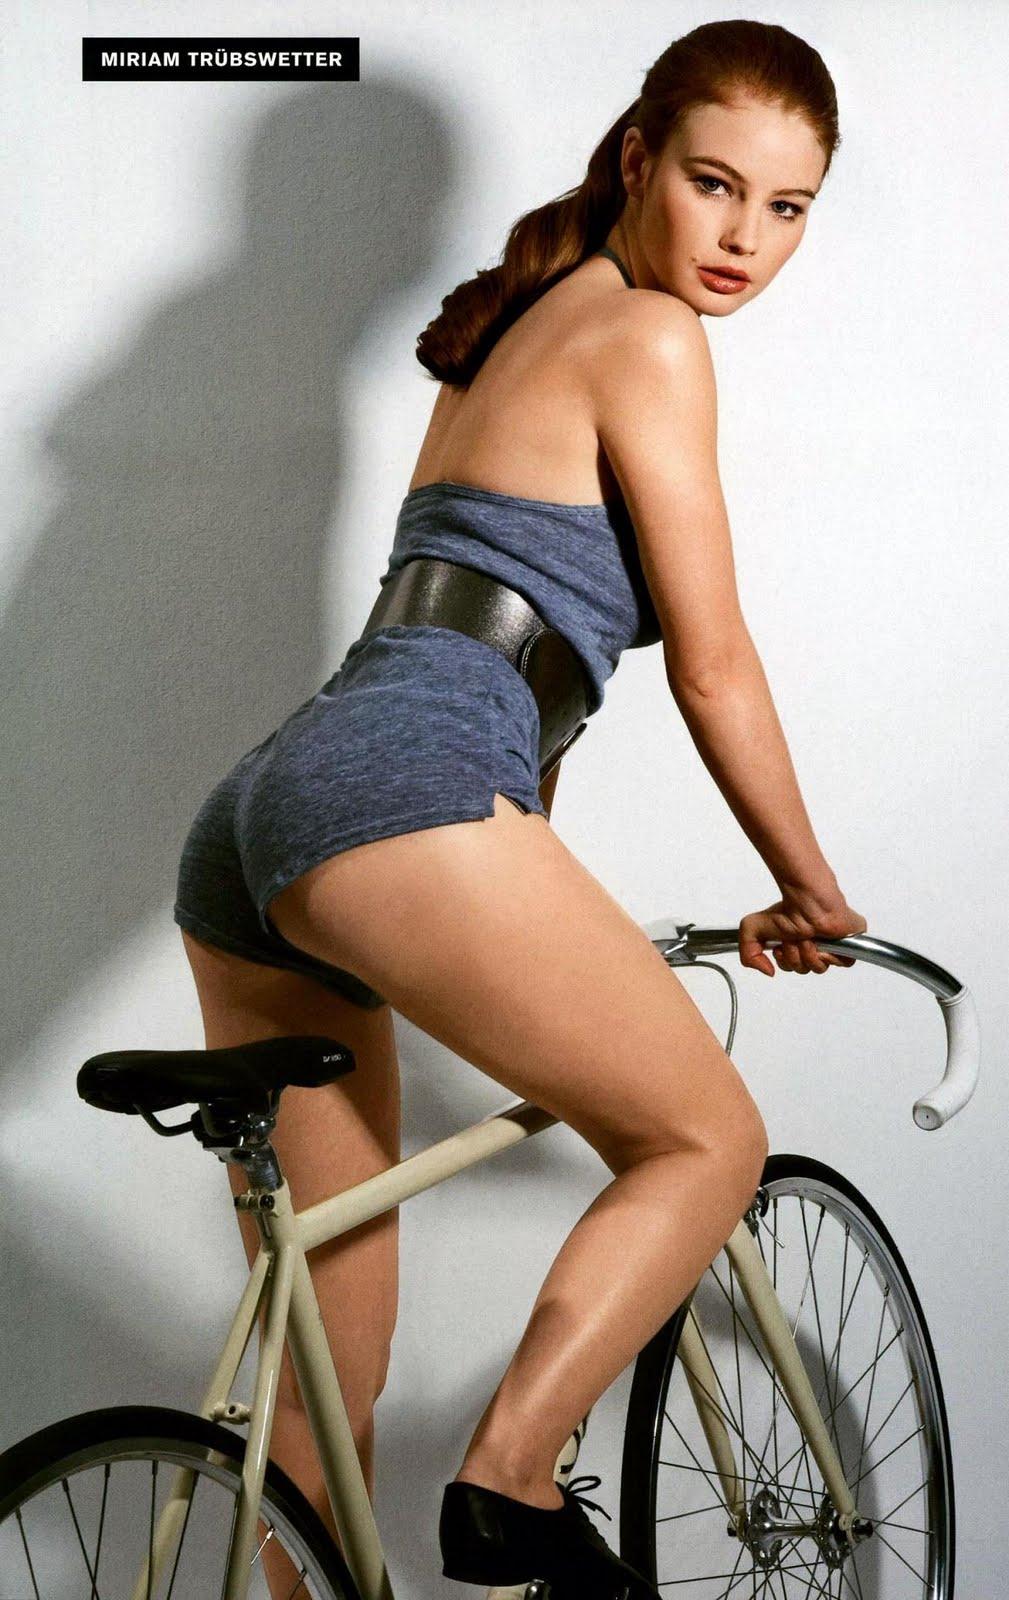 Thinspiration & Fitspiration: Fitspiration - Cycling